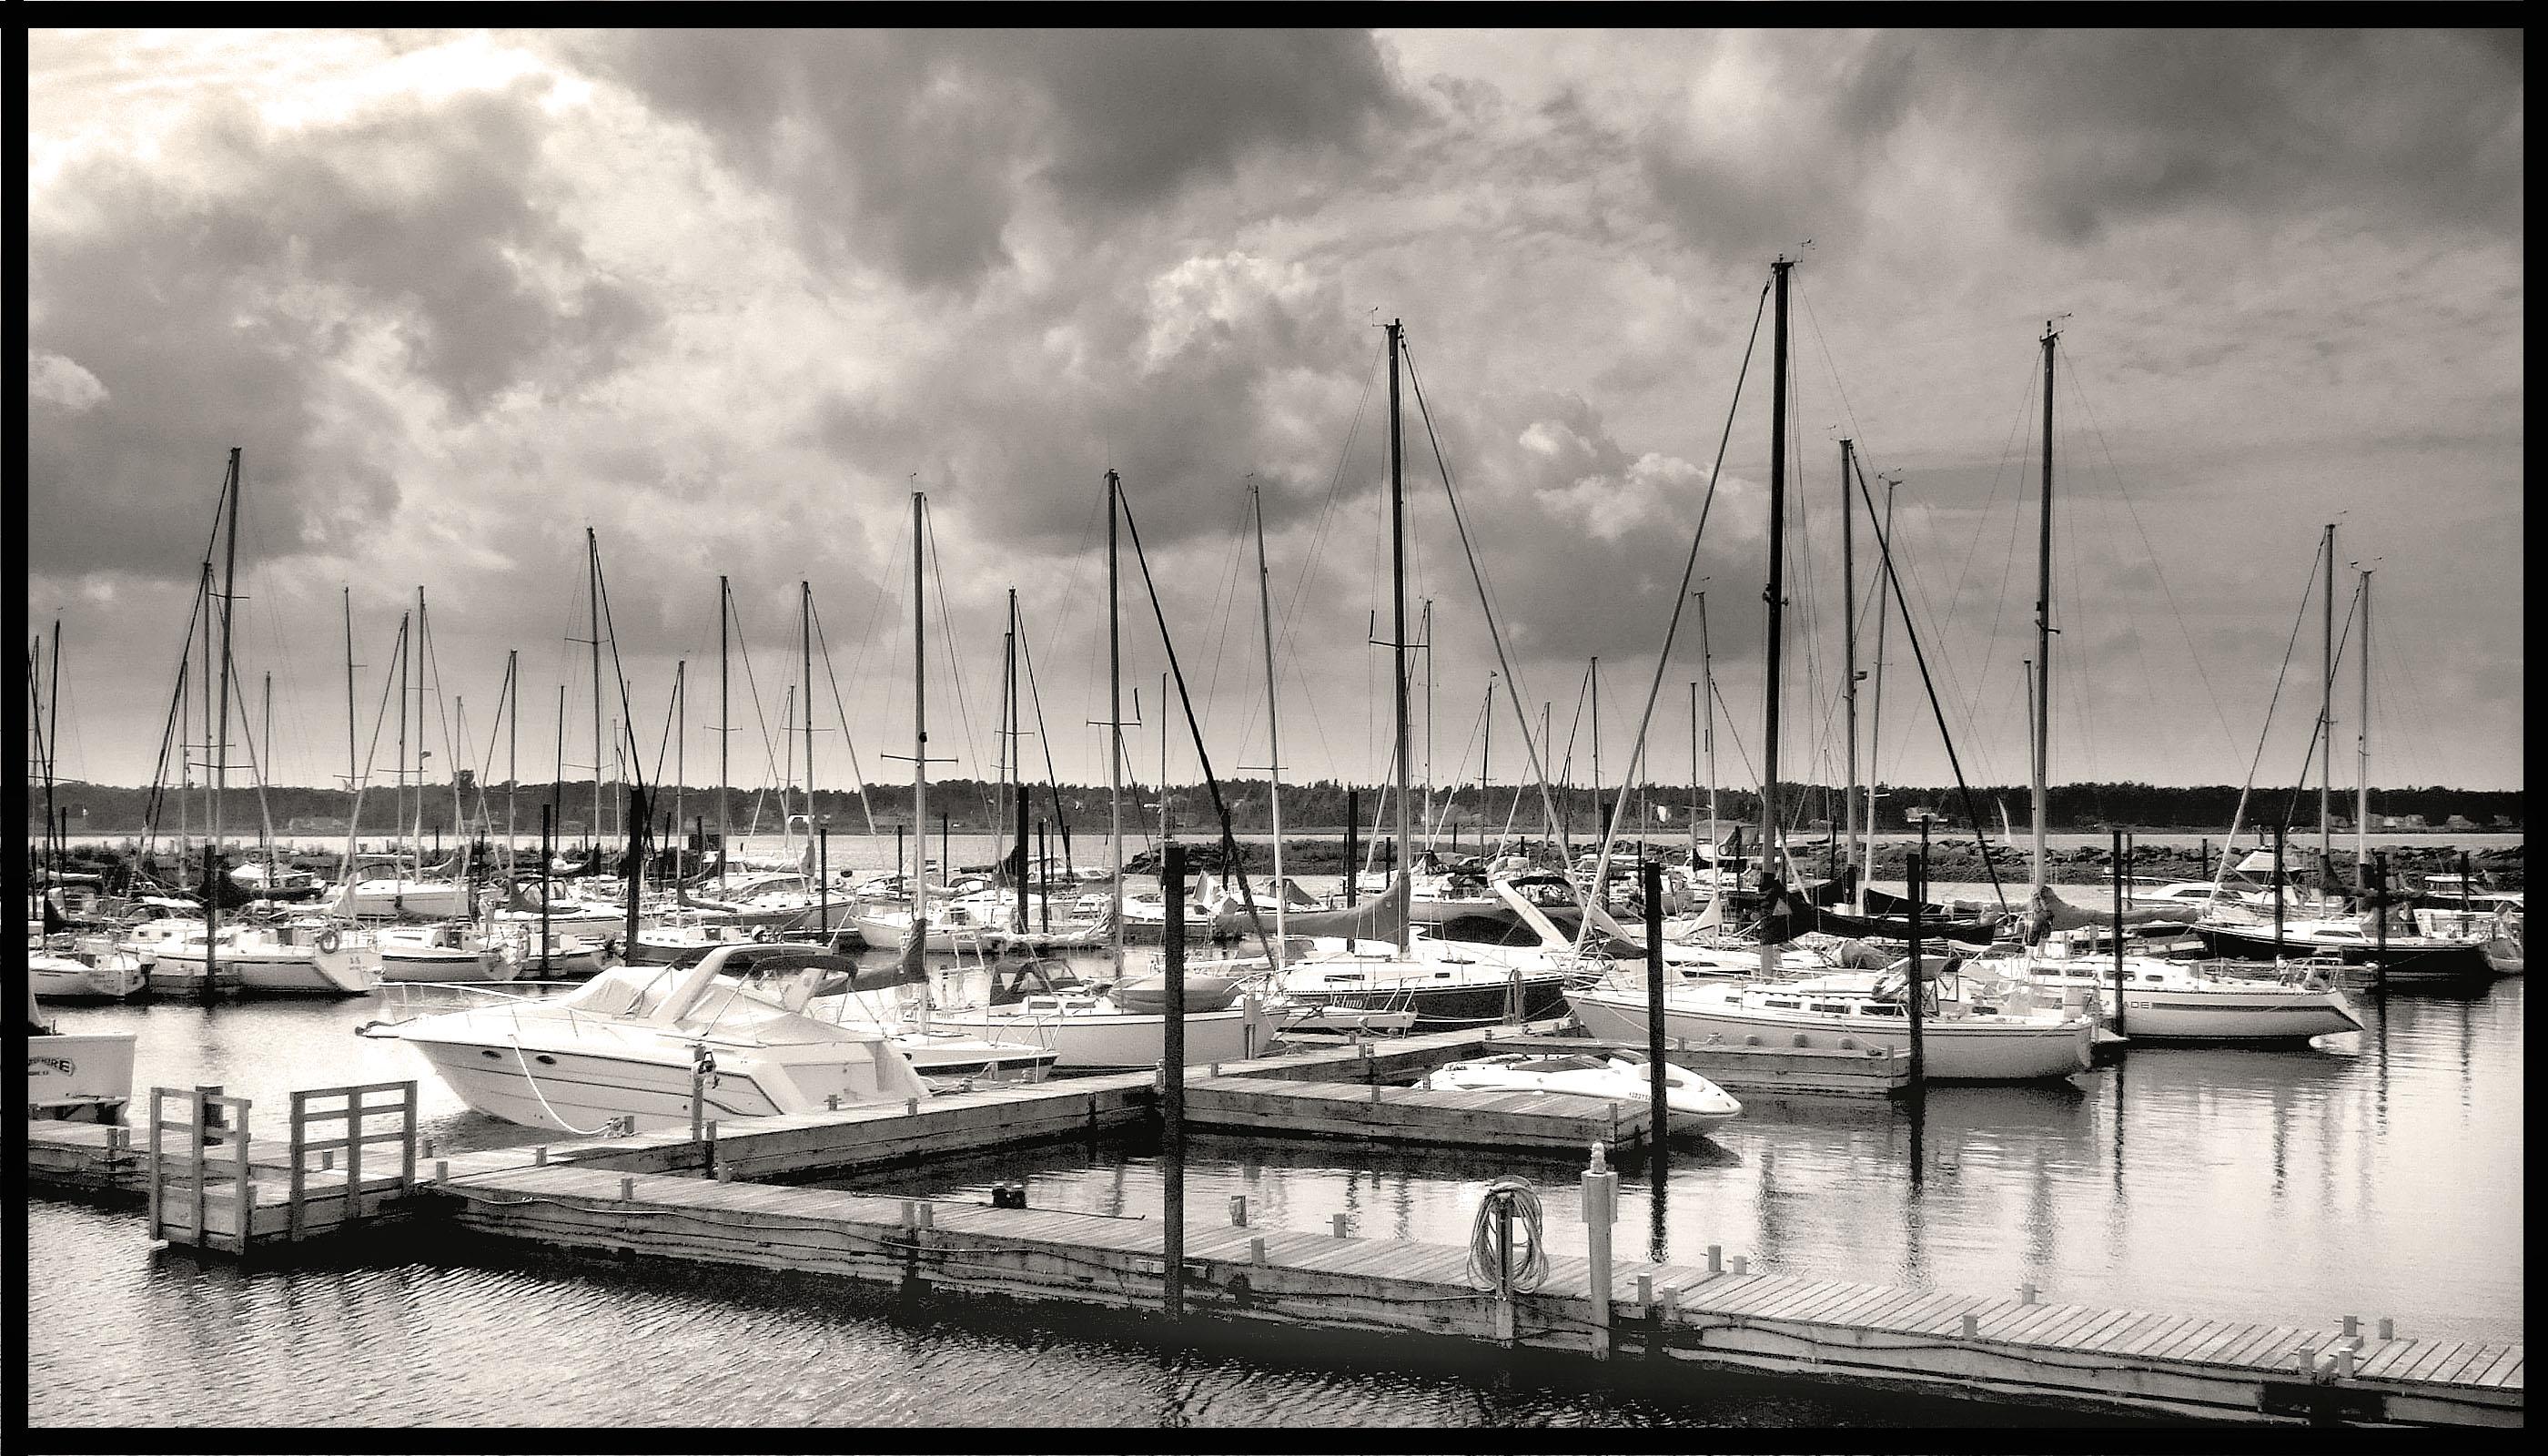 narina bateaux